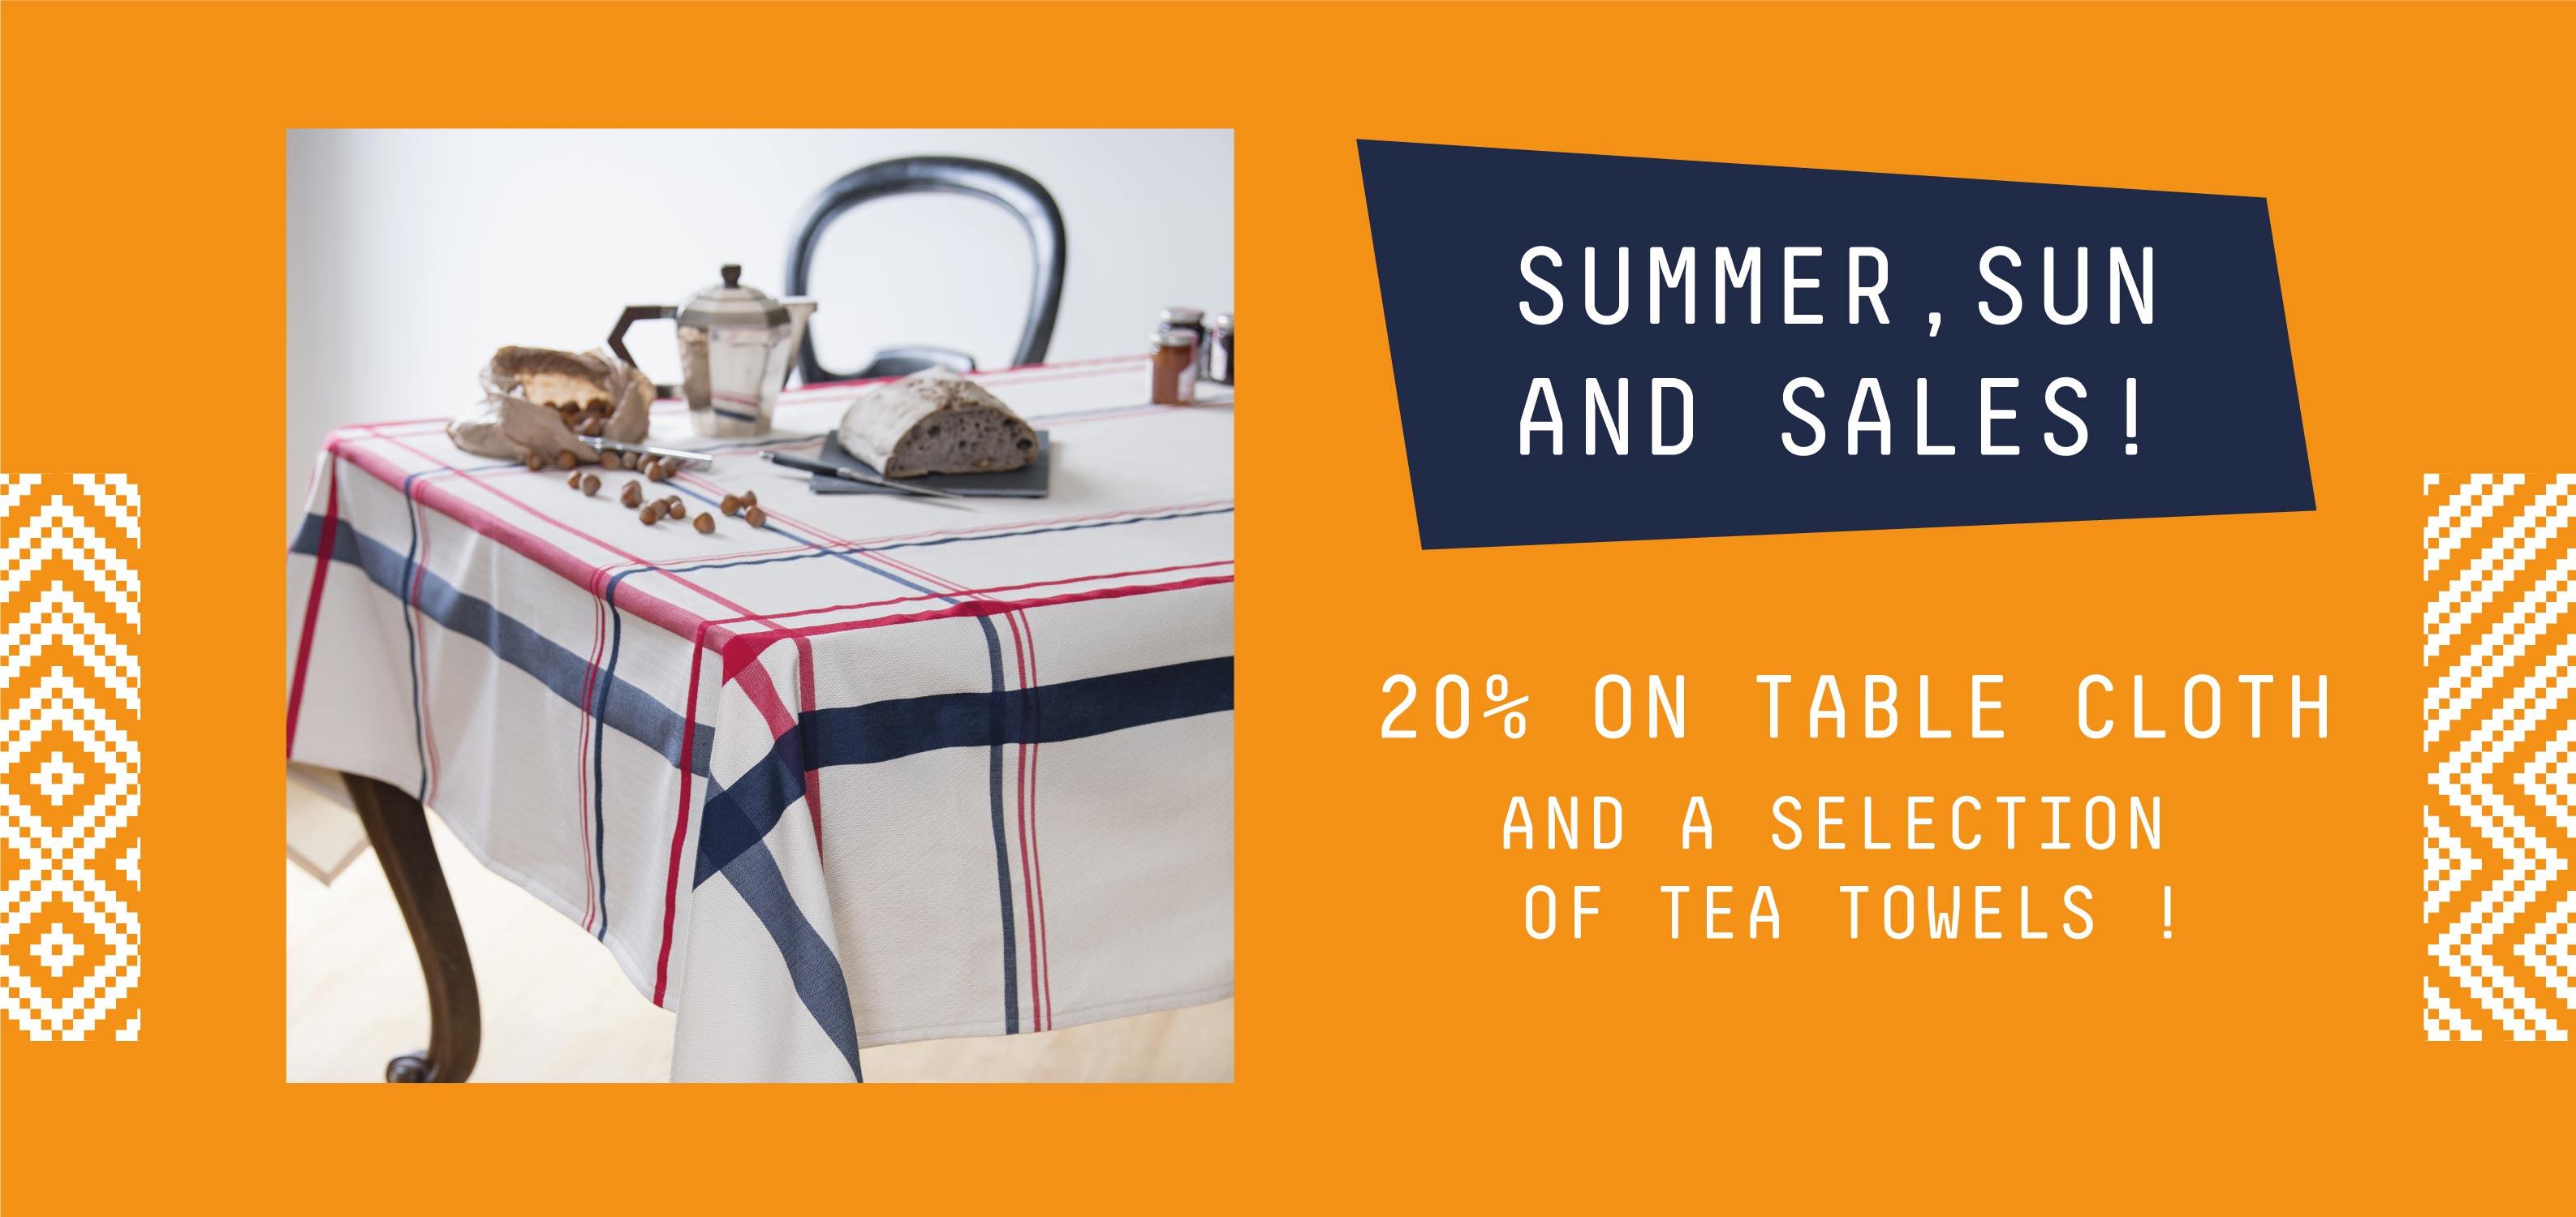 Carrousel sales summer 2020